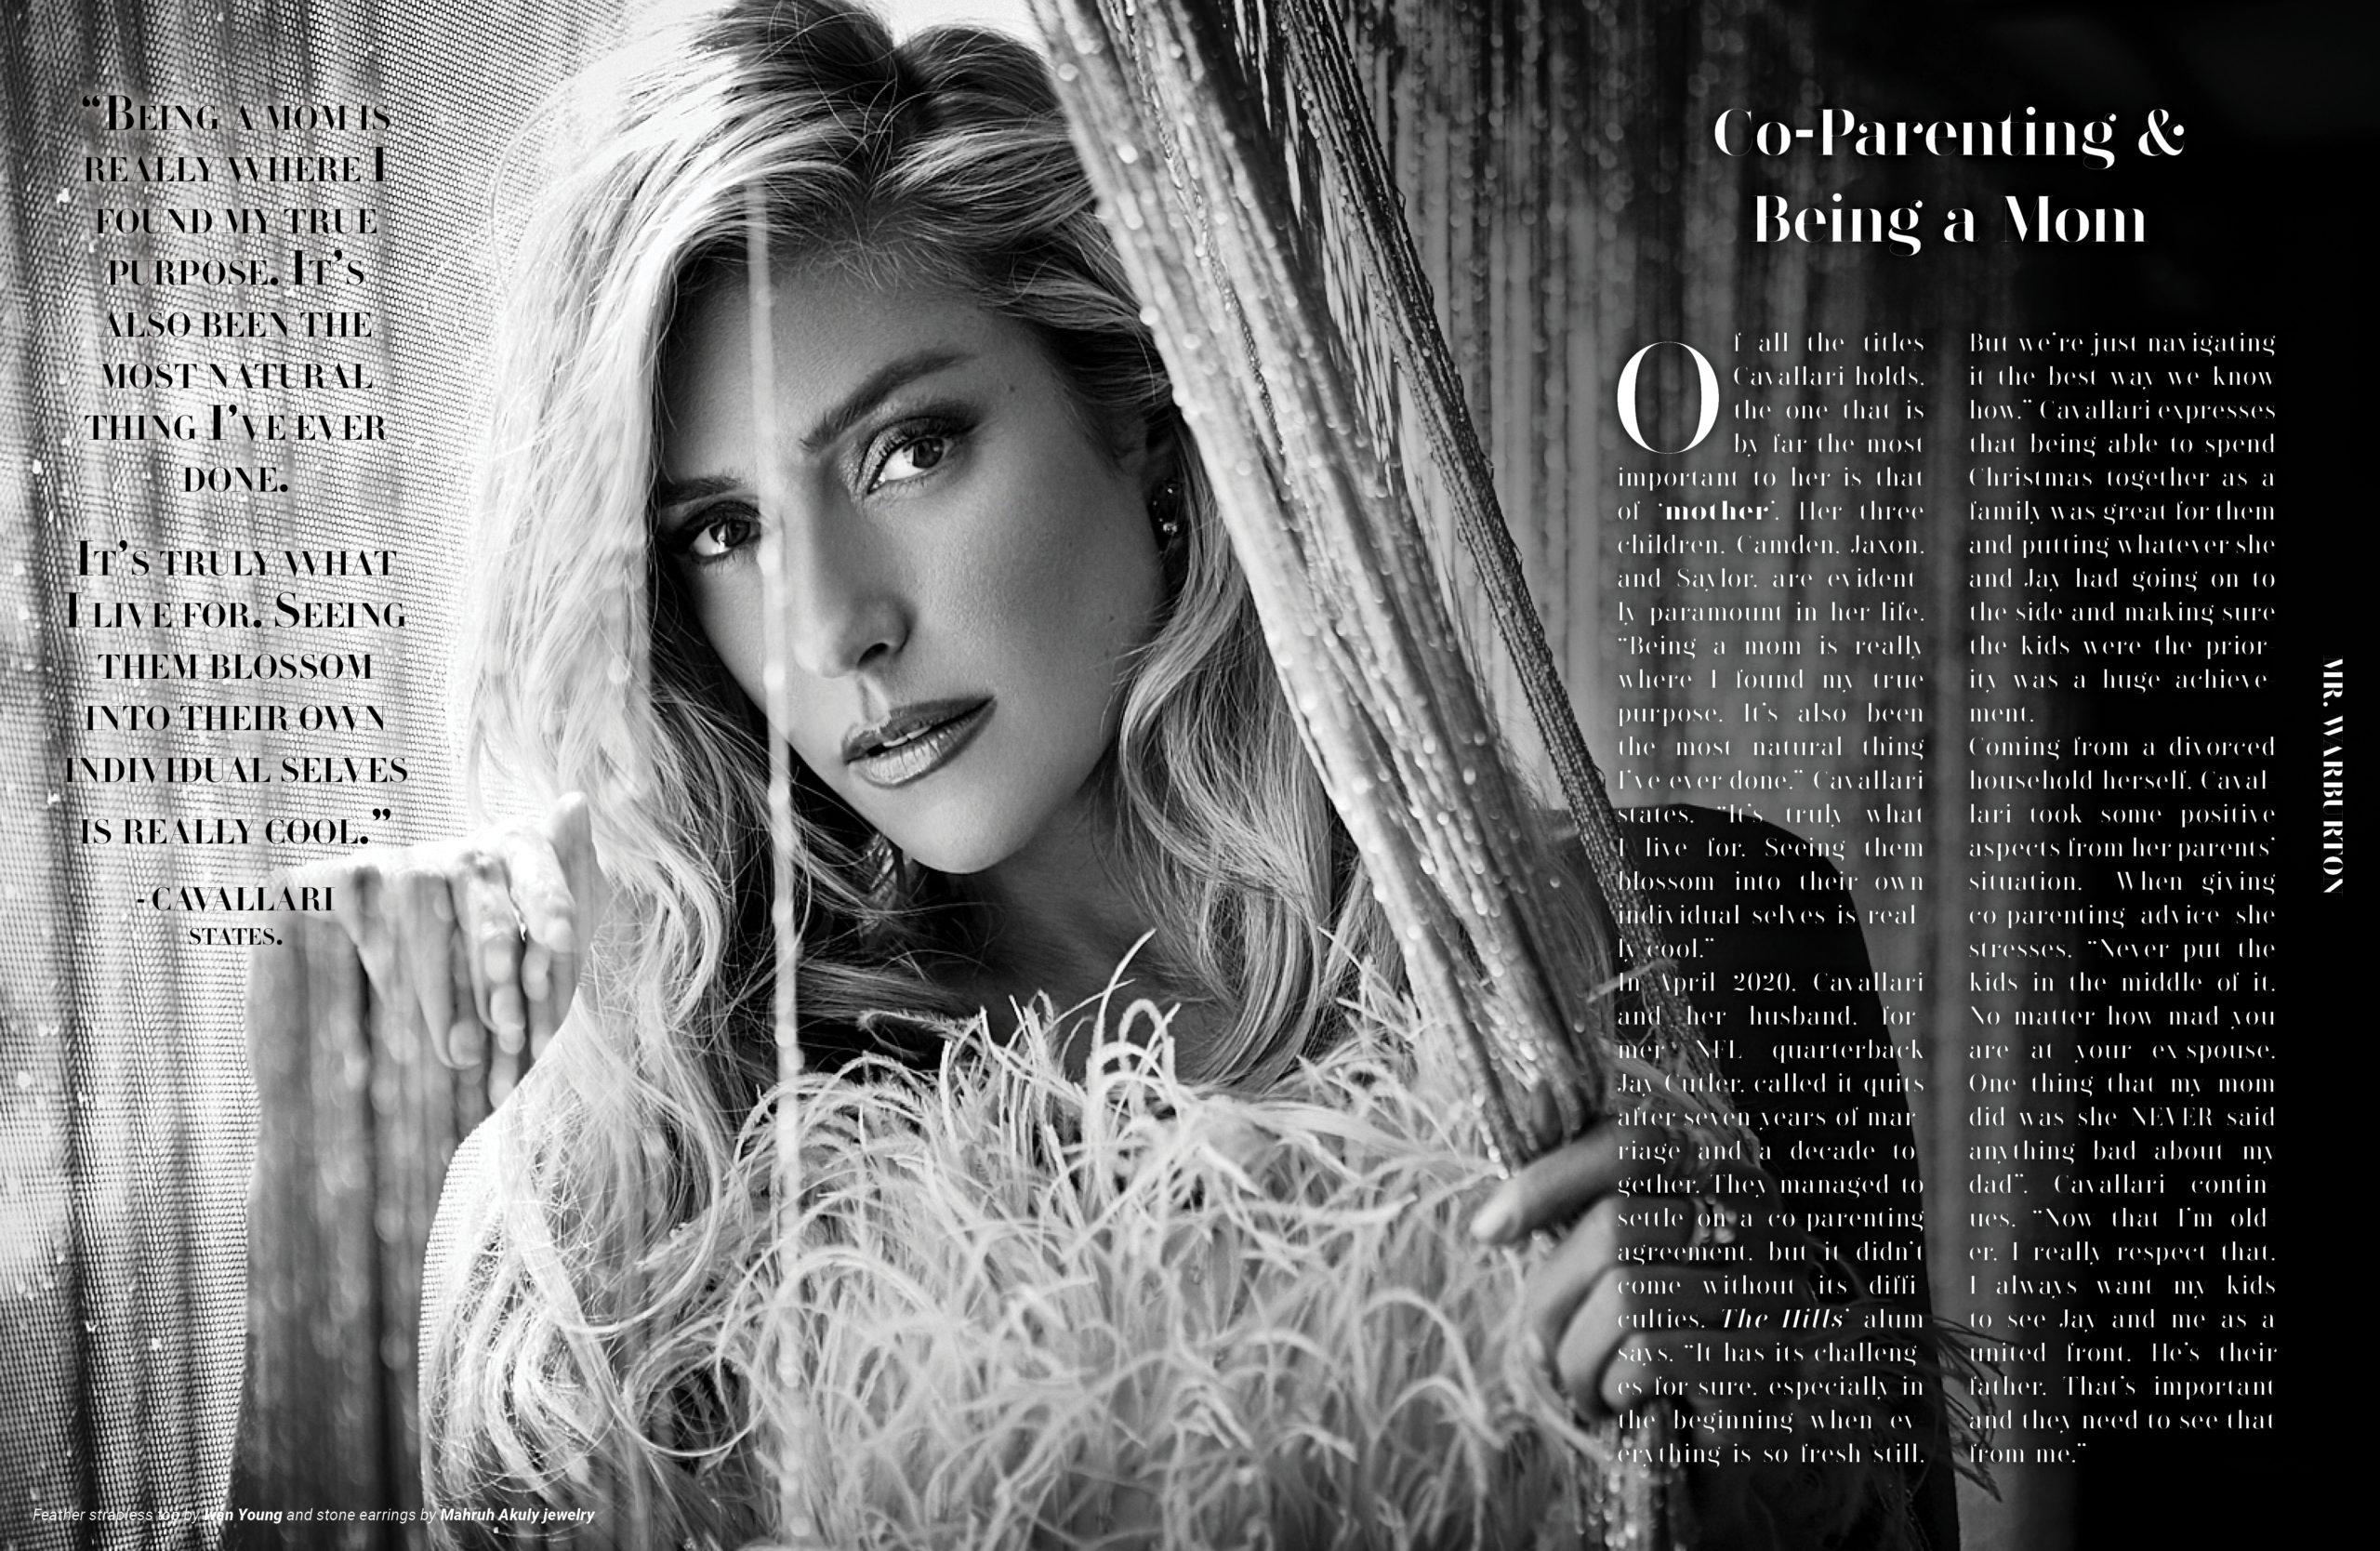 Mr. Warburton Magazine Kristin Cavallari